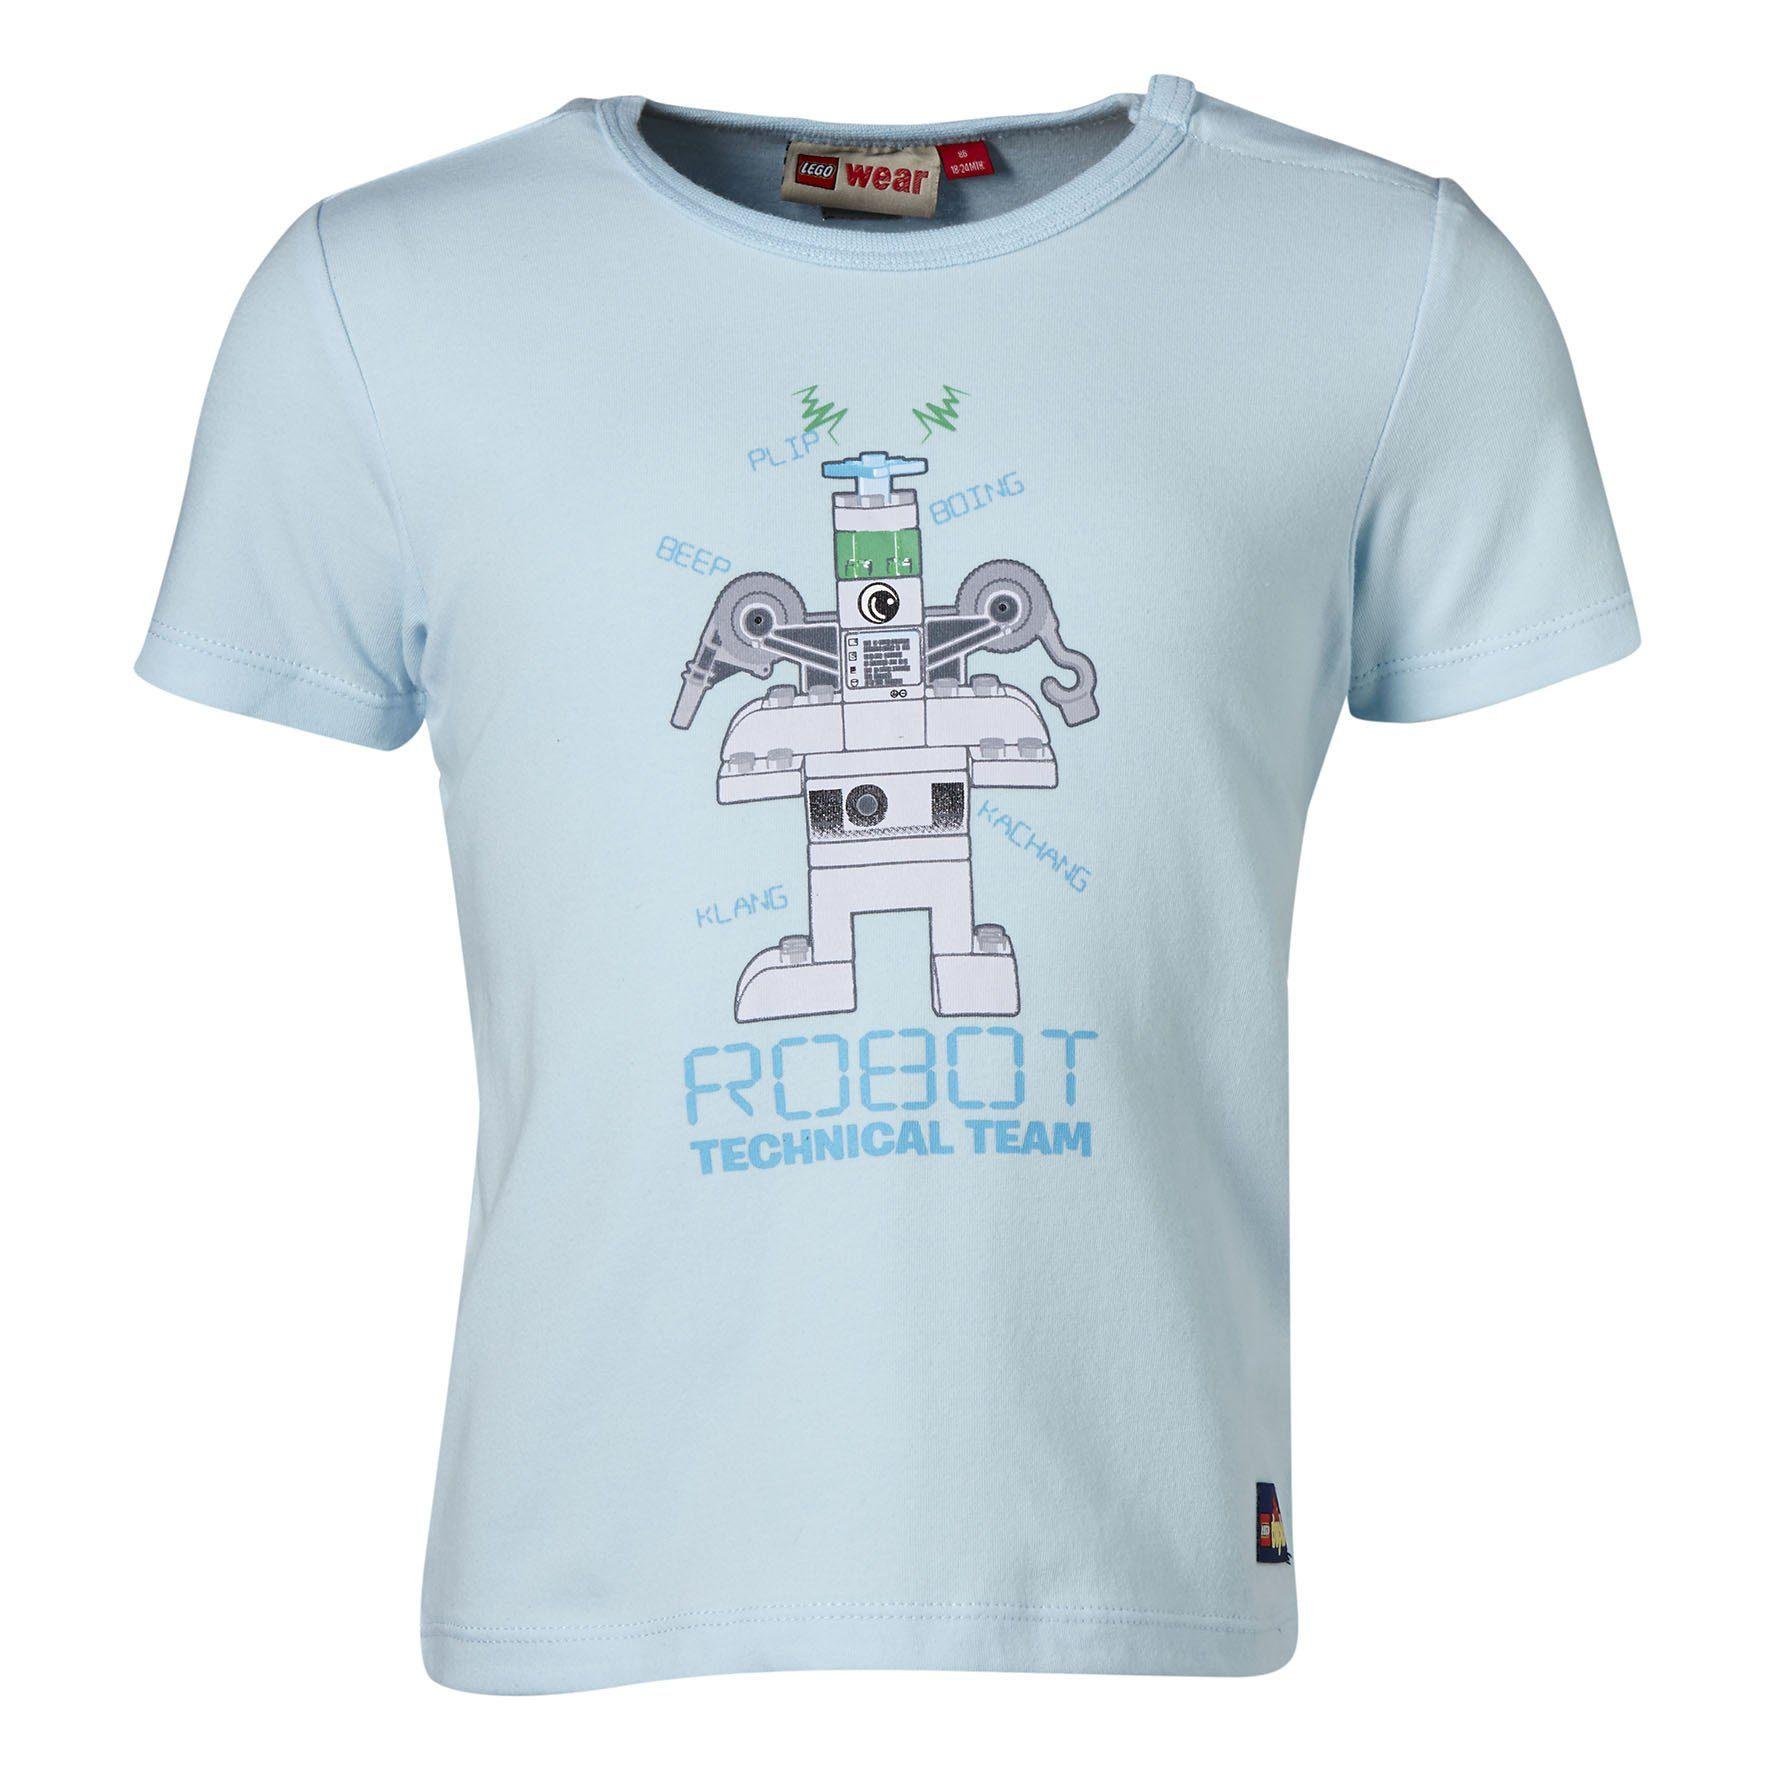 "LEGO Wear Duplo T-Shirt ""ROBOT Technical Team"" Shirt Glow in the Dark Trey"